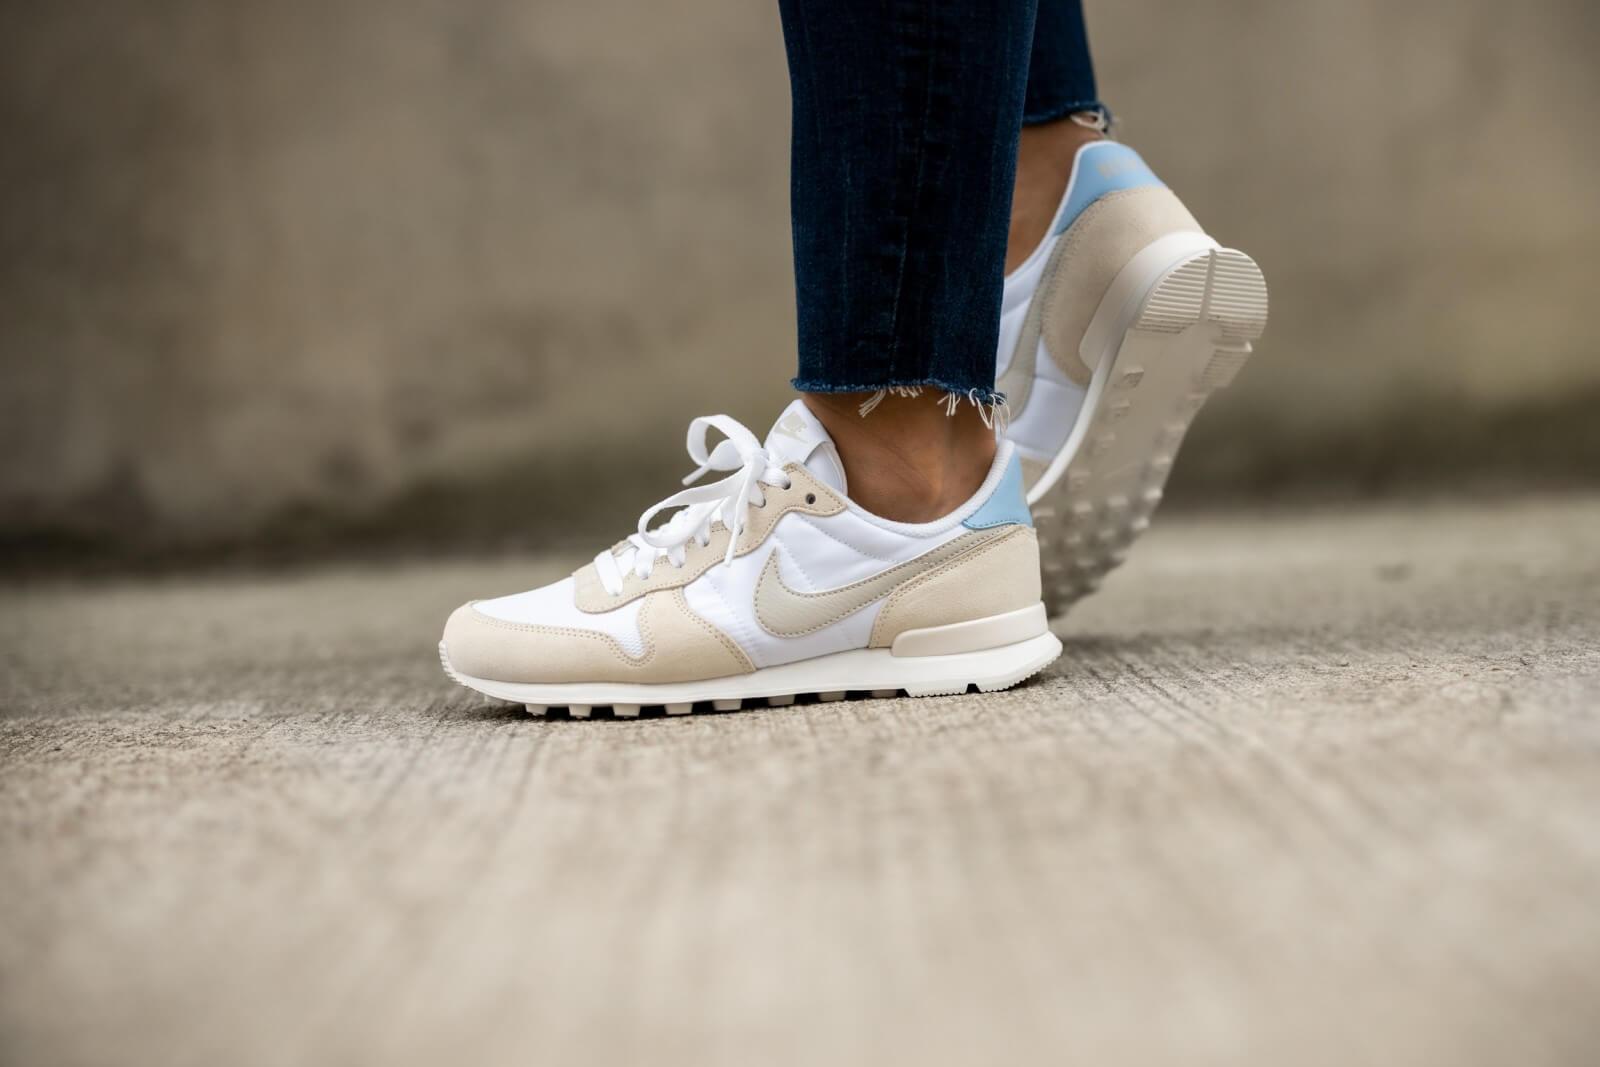 Nike Women's Internationalist White/Light Bone-Pale Ivory-Summit White